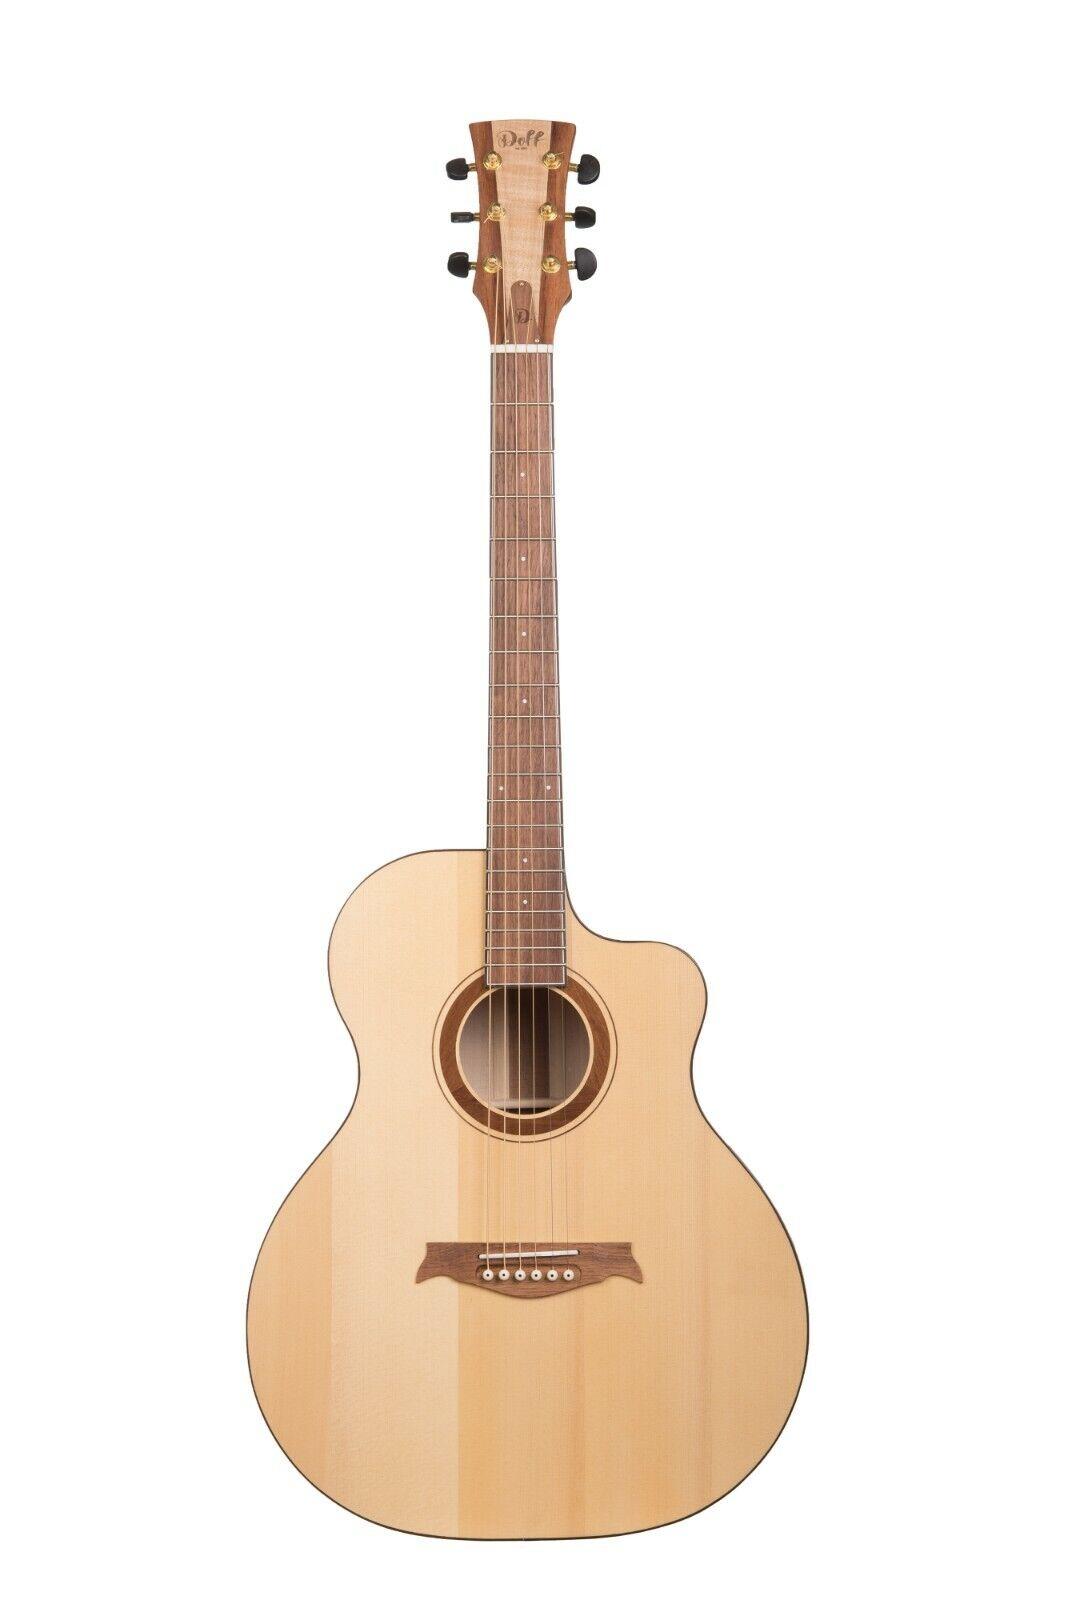 NEW Acoustic guitar   Doff 013 Jumbo Cutaway